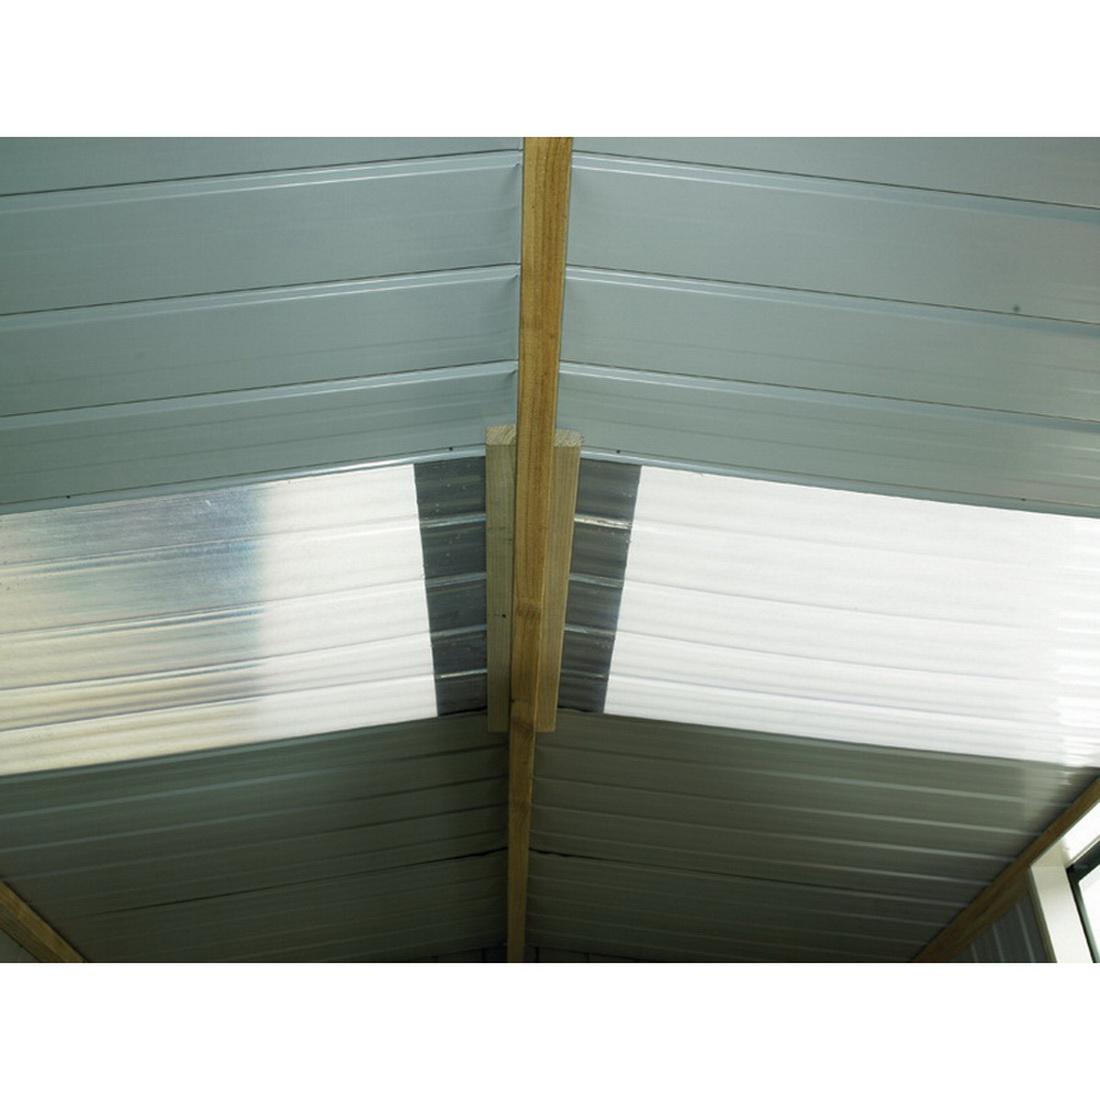 Kiwi Single Side Type A Clear Roof Panel Polycarbonate KCRPAO